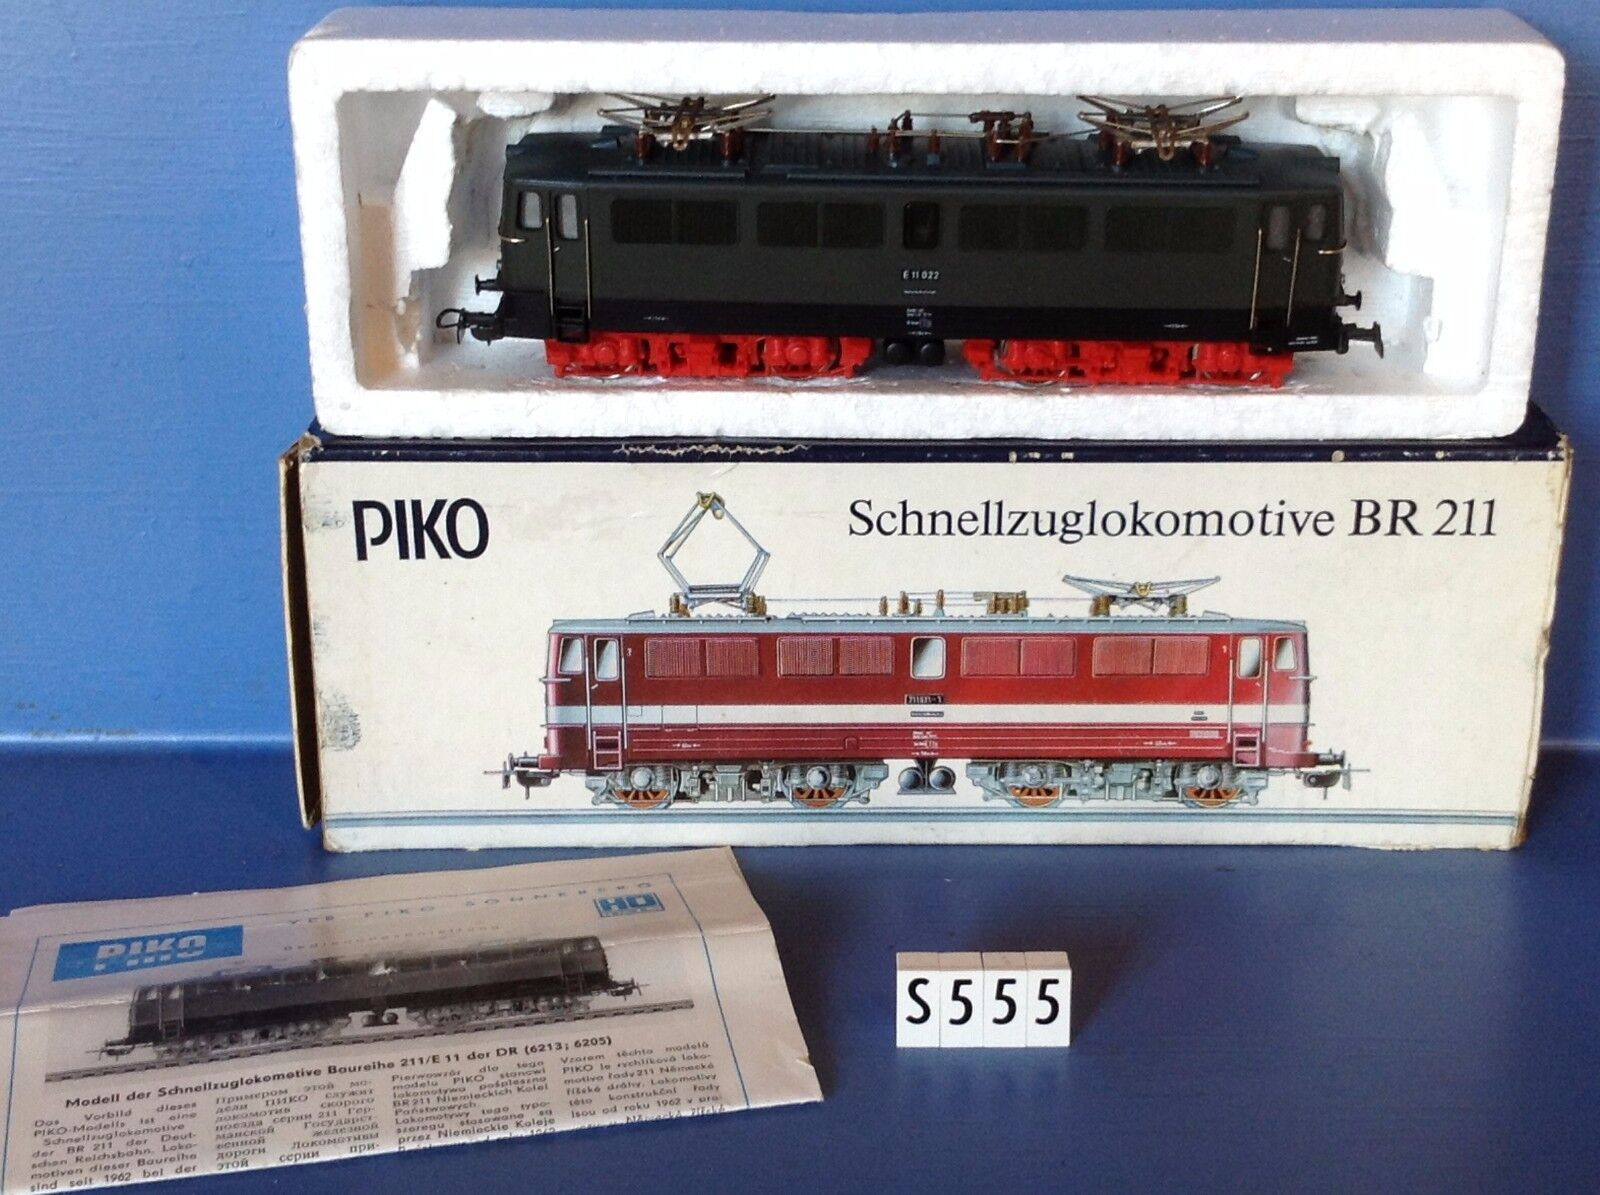 (S555) locomotive E11 022 BR 211 en boite Piko - Fleishmann Jouef, ech   Ho